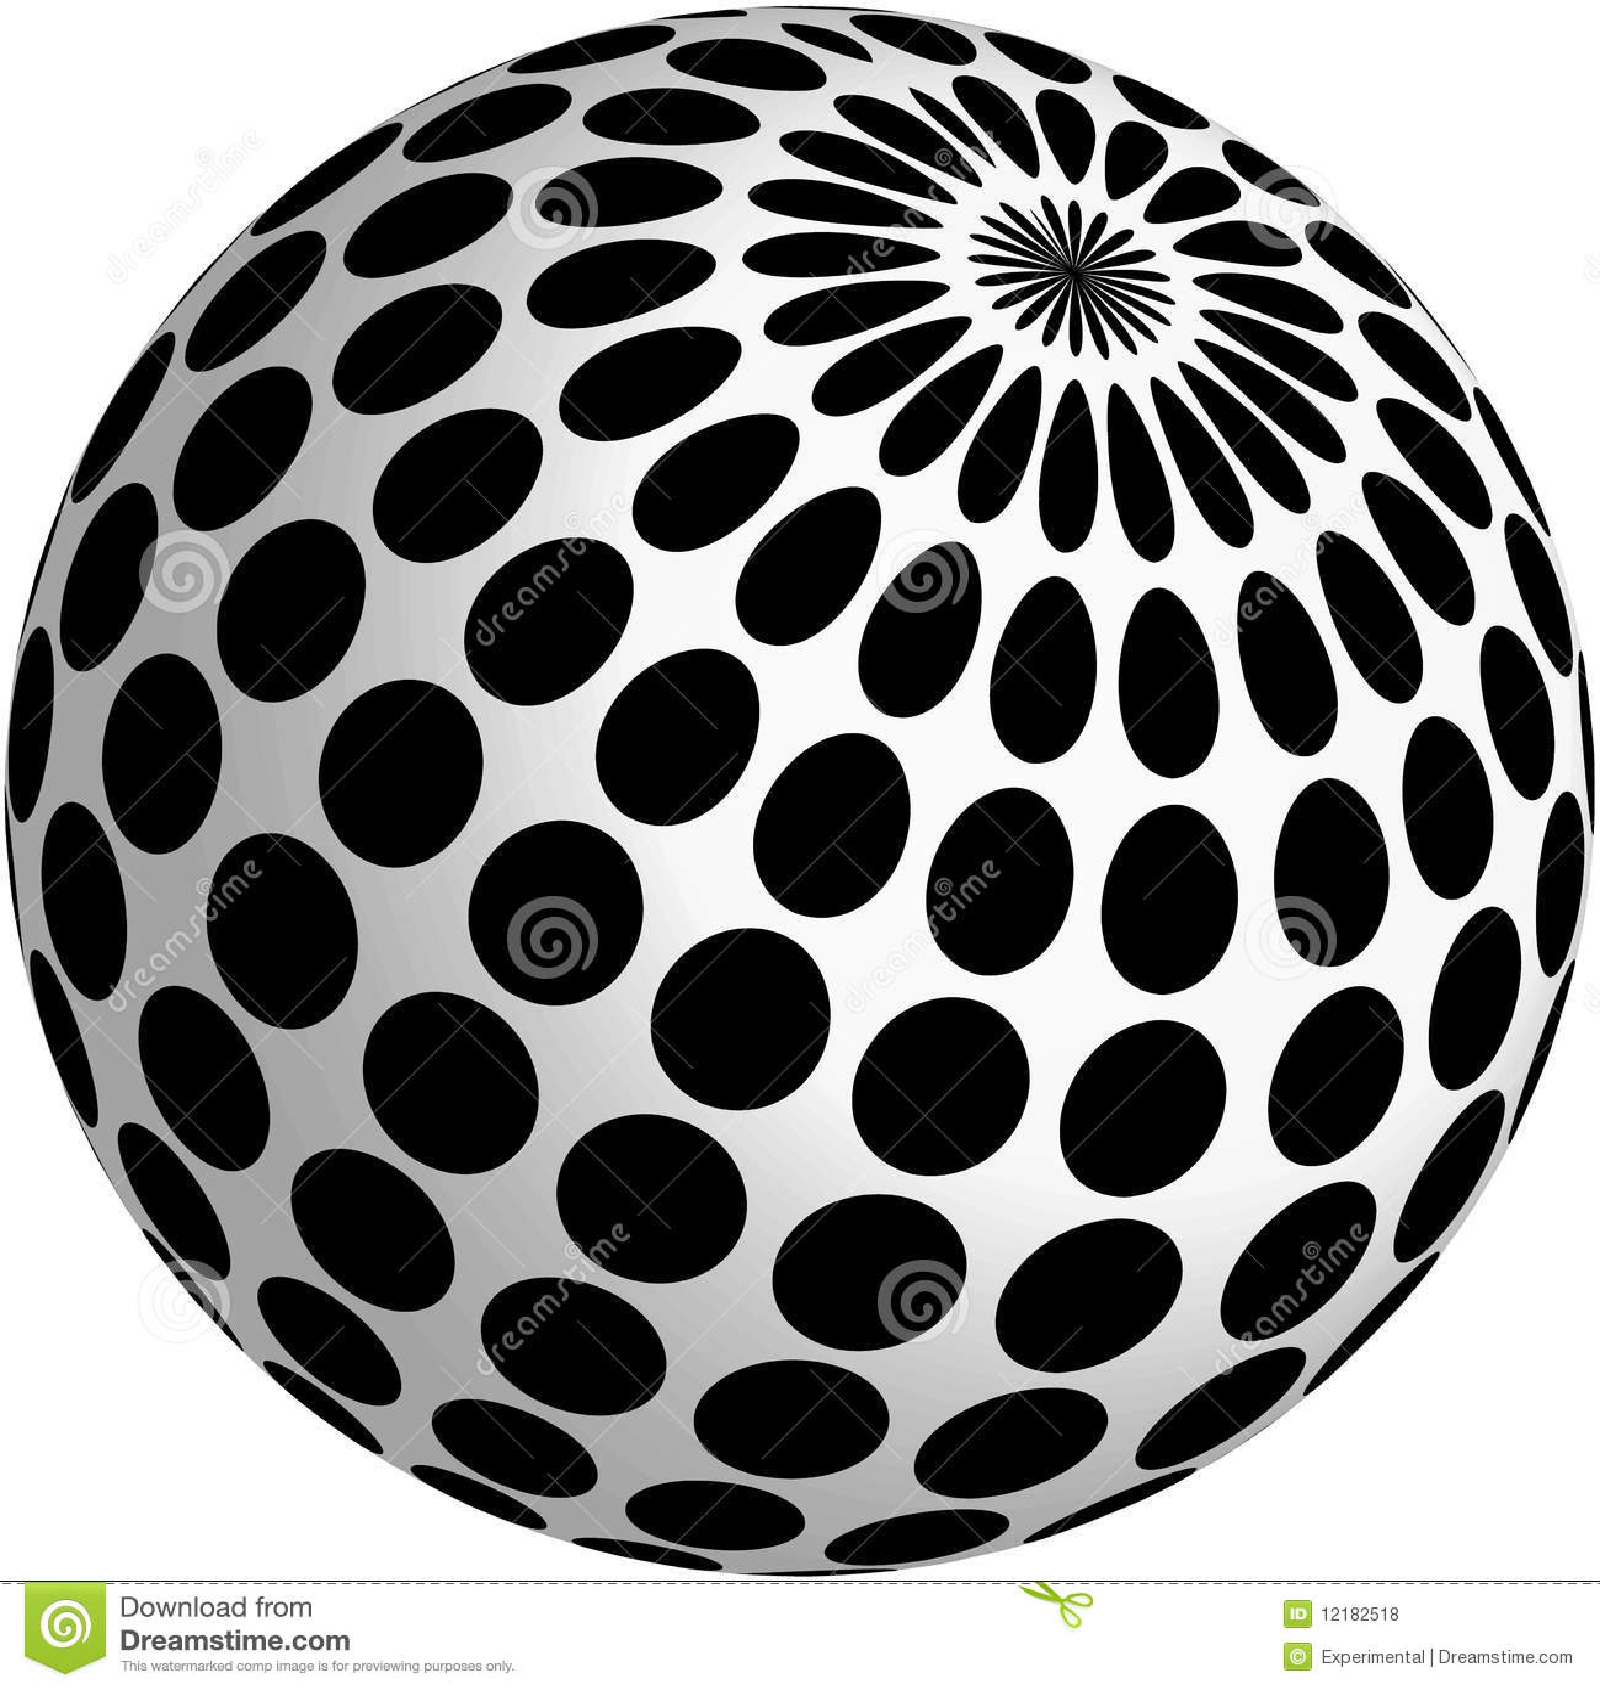 3d ball design with black dots stock illustration image for 3d design online free